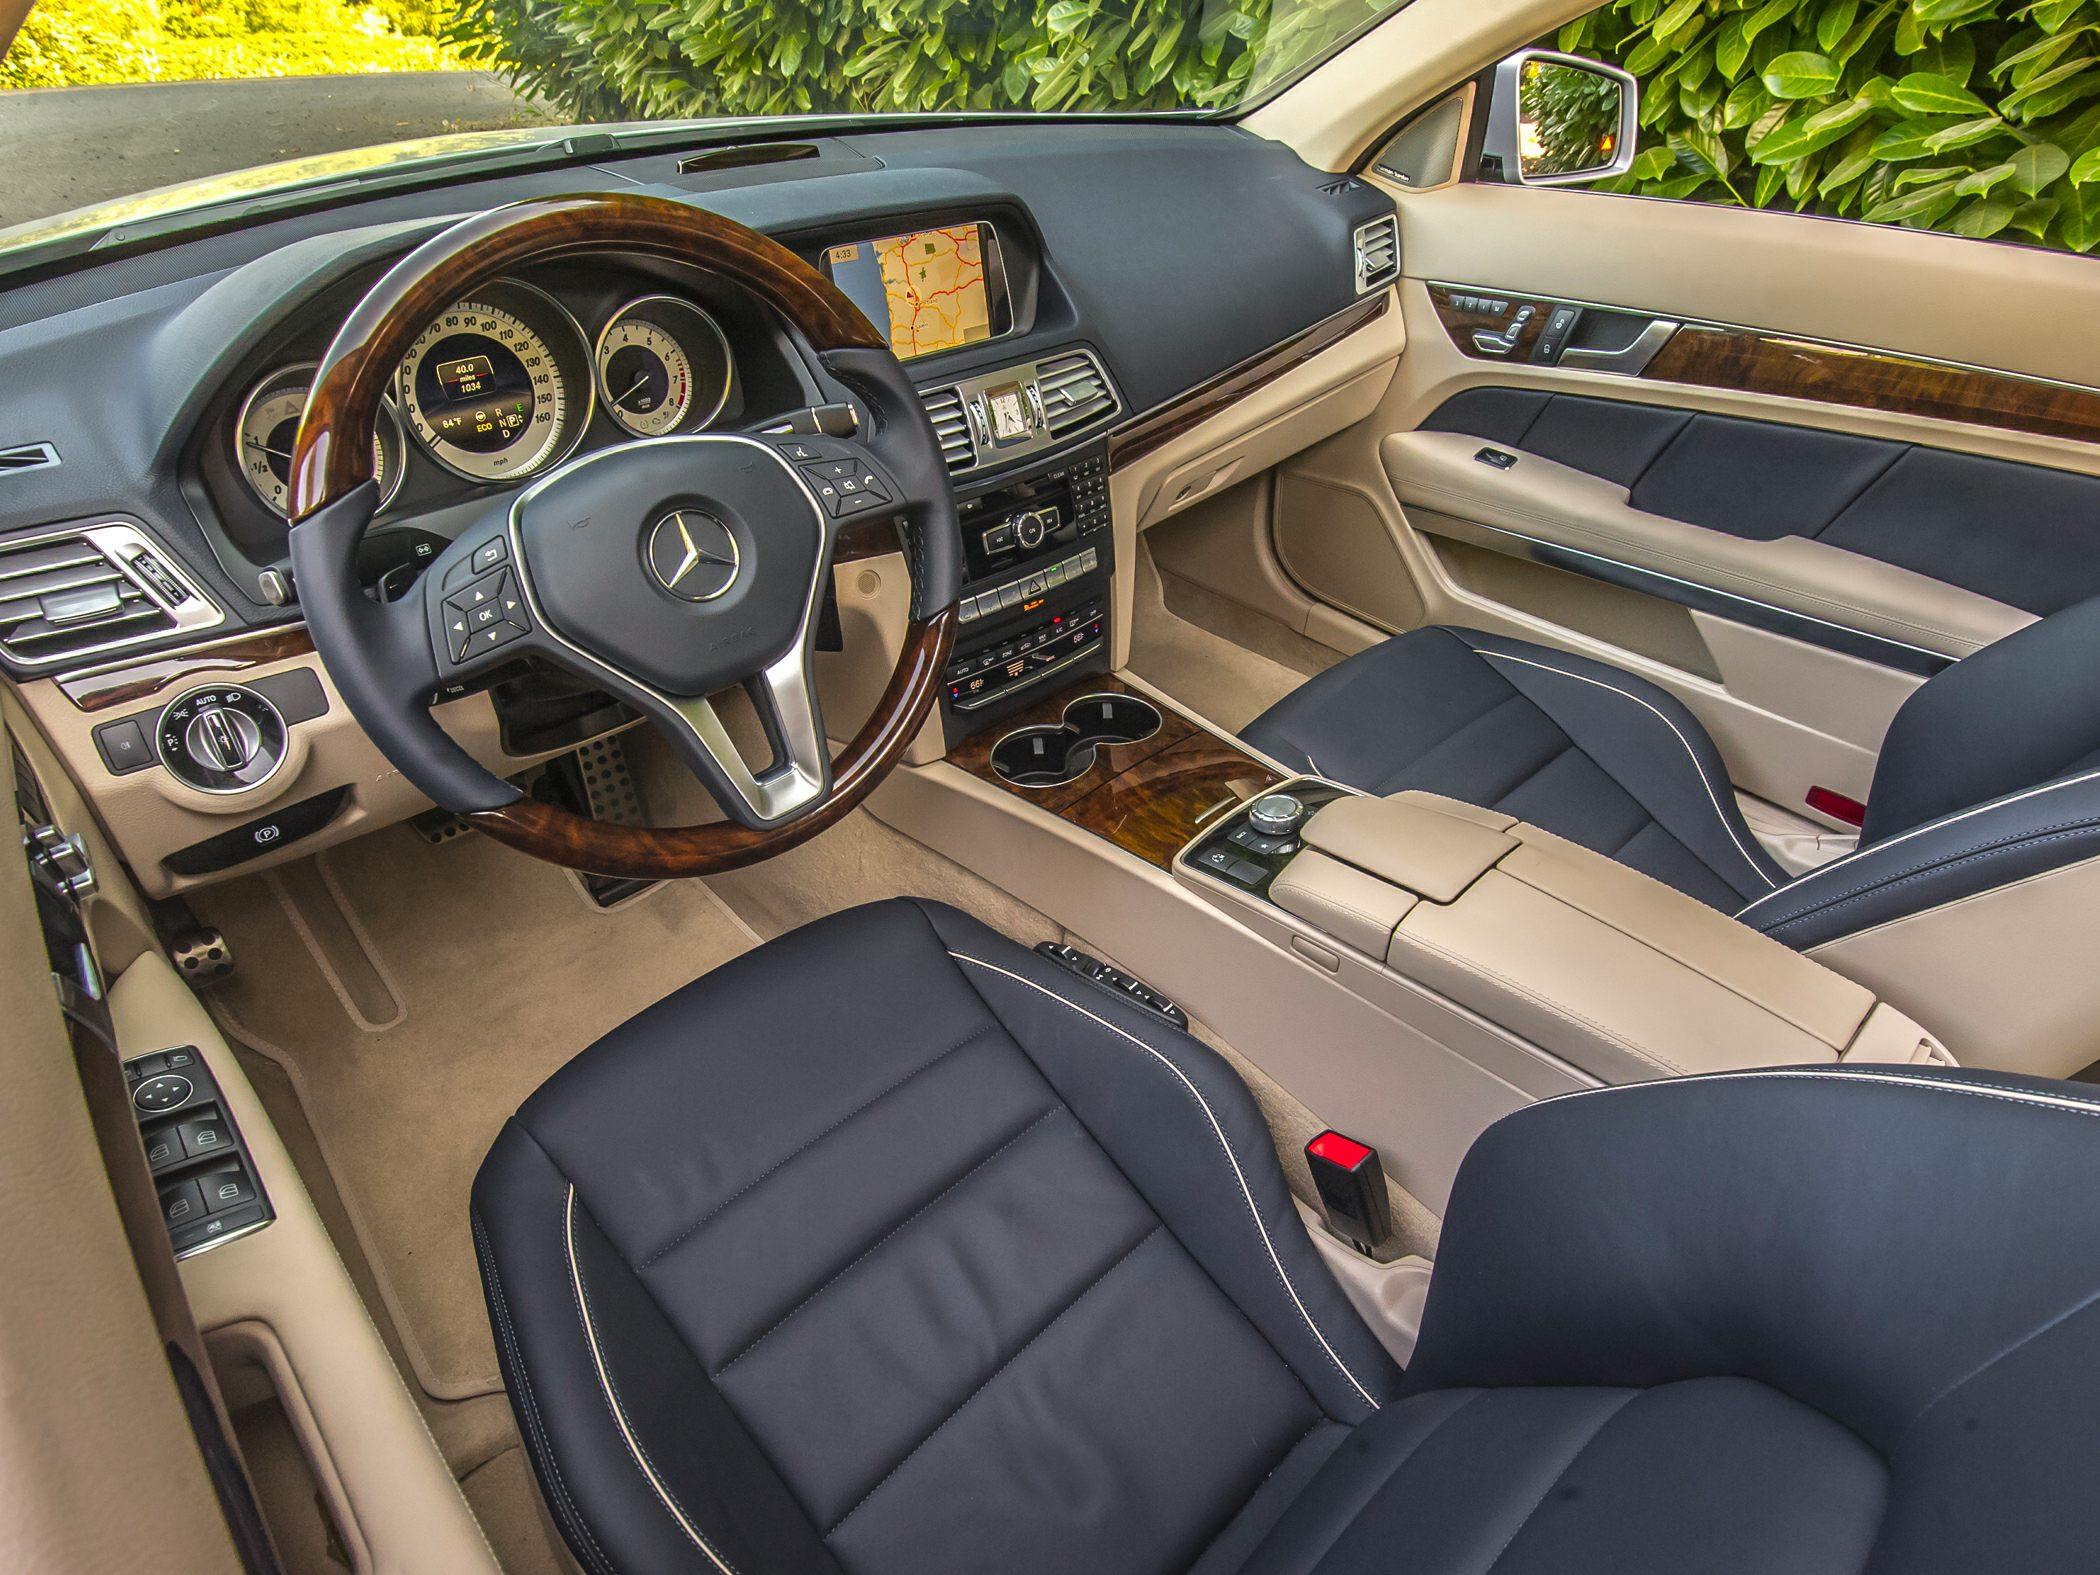 2017 mercedes benz e400 deals prices incentives leases for Mercedes benz e350 interior